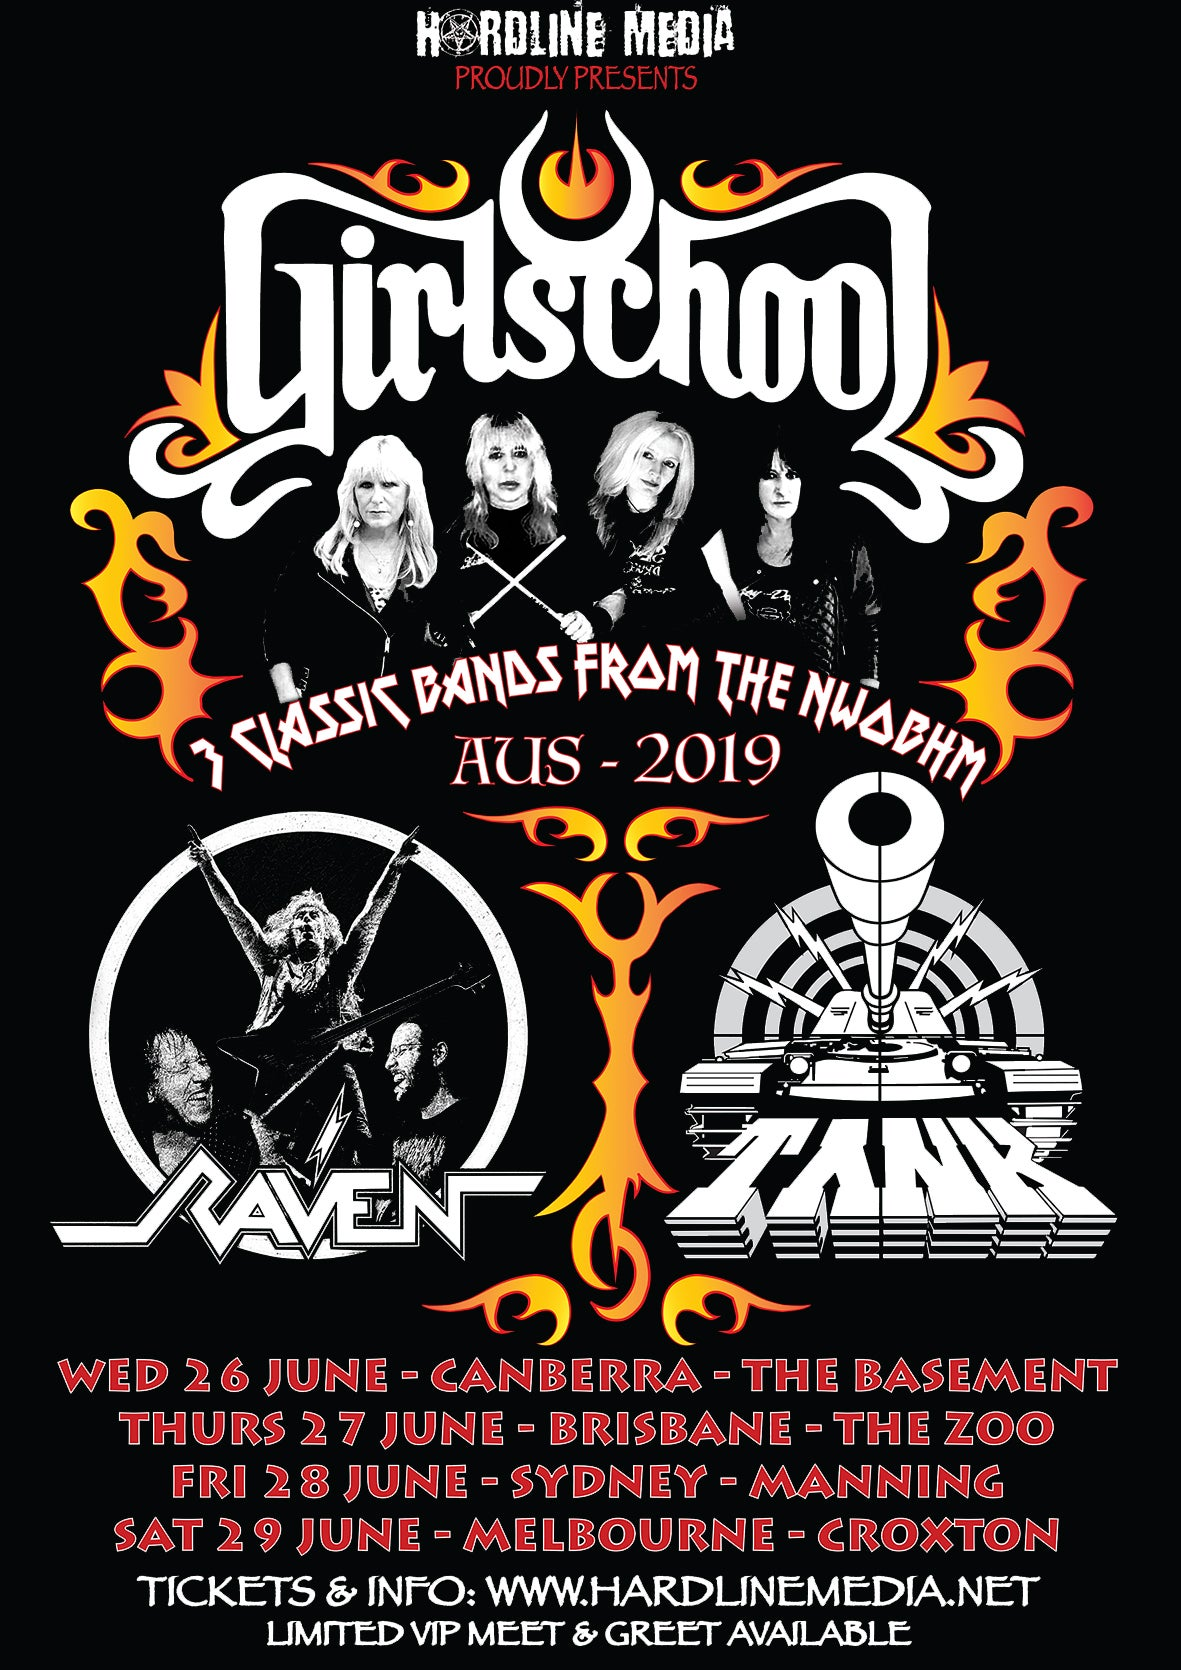 Image of VIP TICKET - GIRLSCHOOL + RAVEN + TANK - SYDNEY, MANNING - FRI 28 JUNE